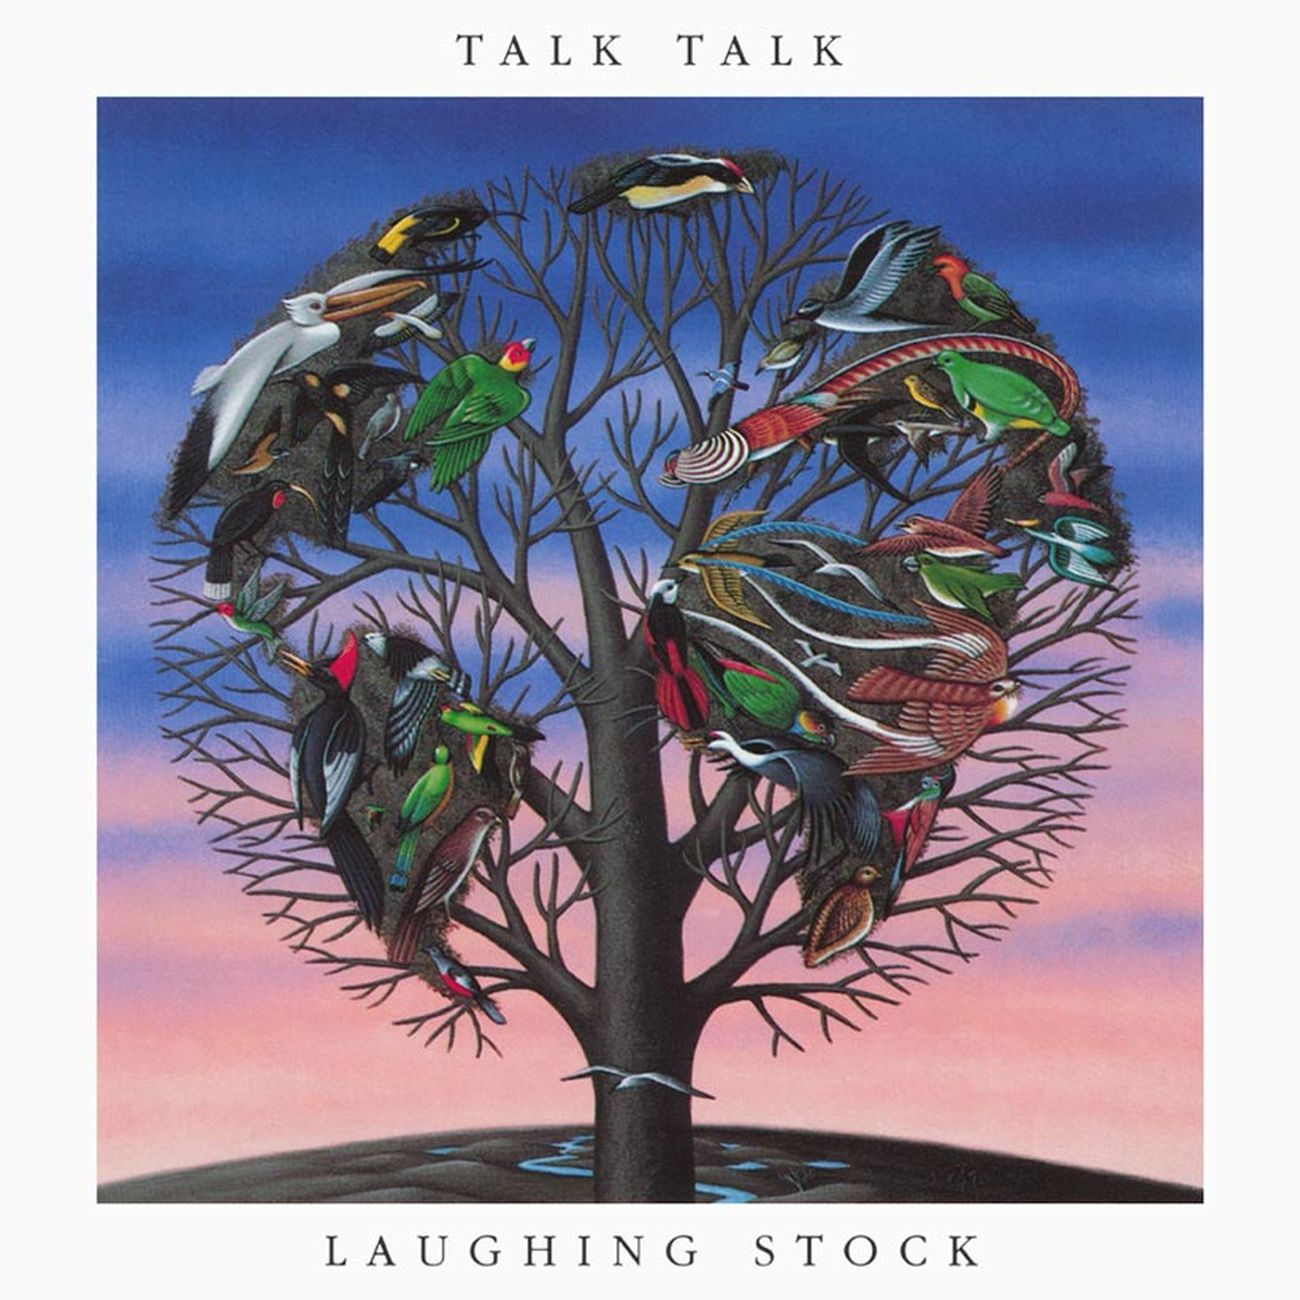 Talk Talk, Laughing Stock (1991), copertina dell'album